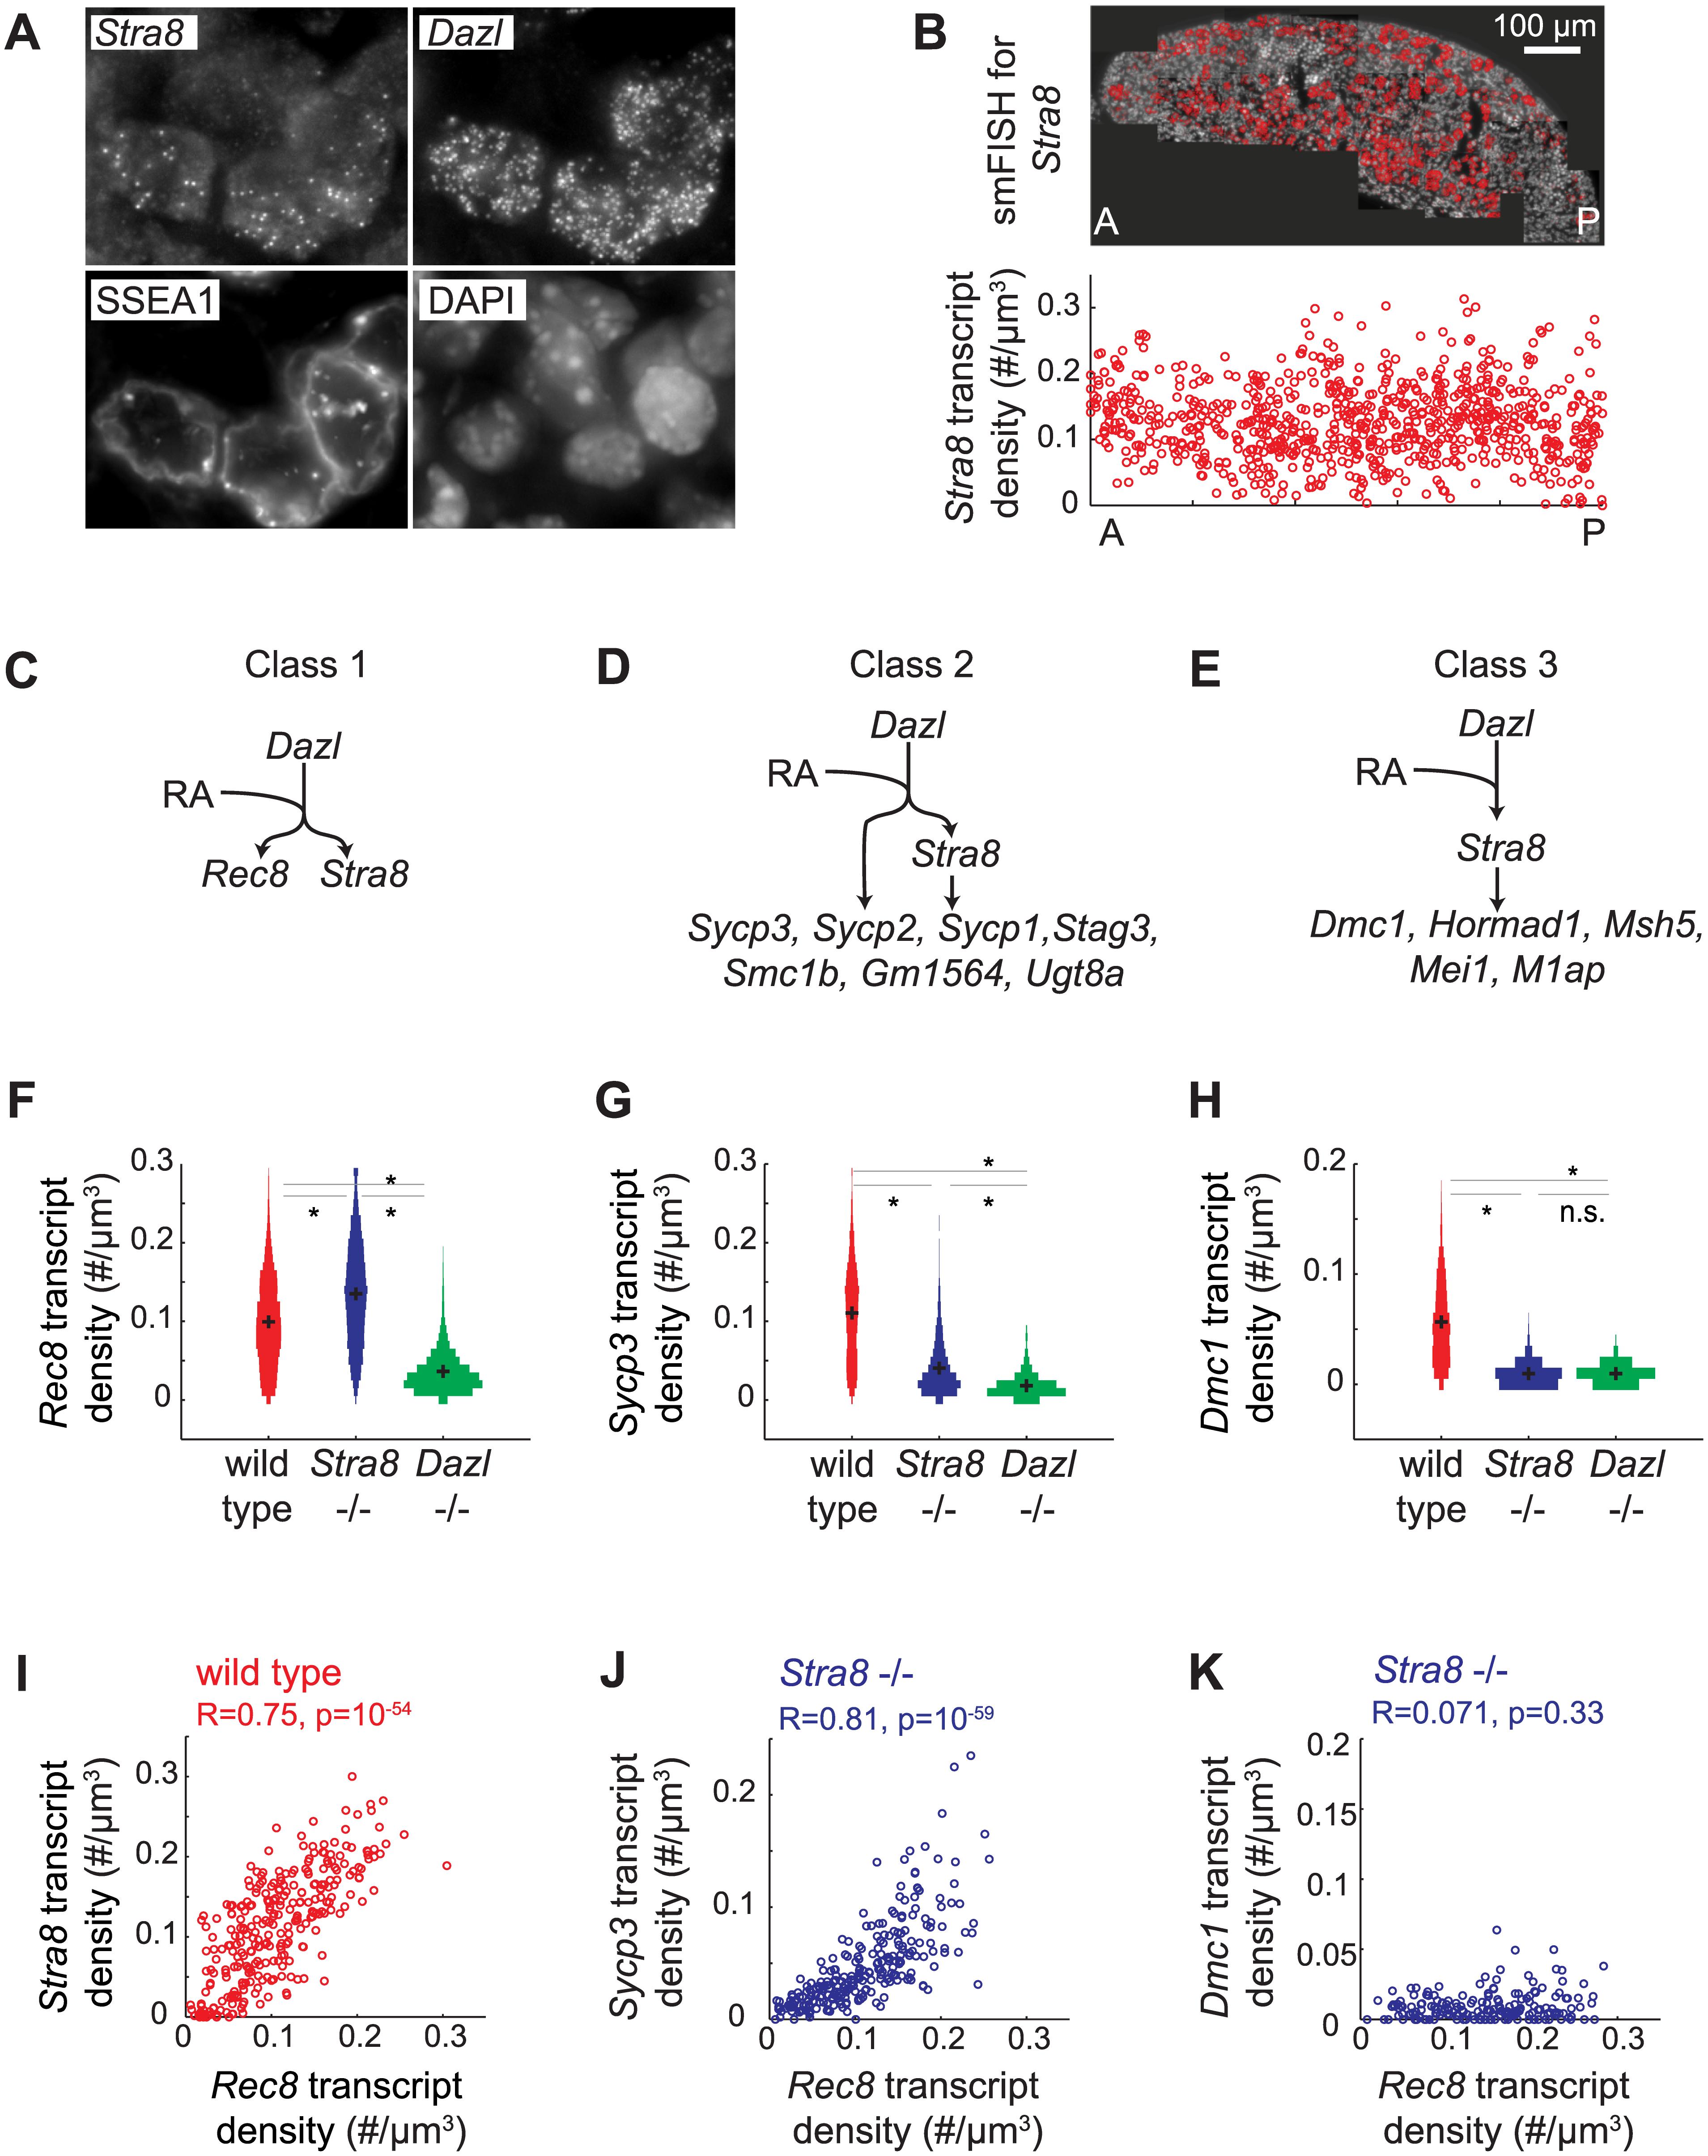 Single molecule FISH analysis corroborates three classes of gene regulation at the level of individual germ cells.